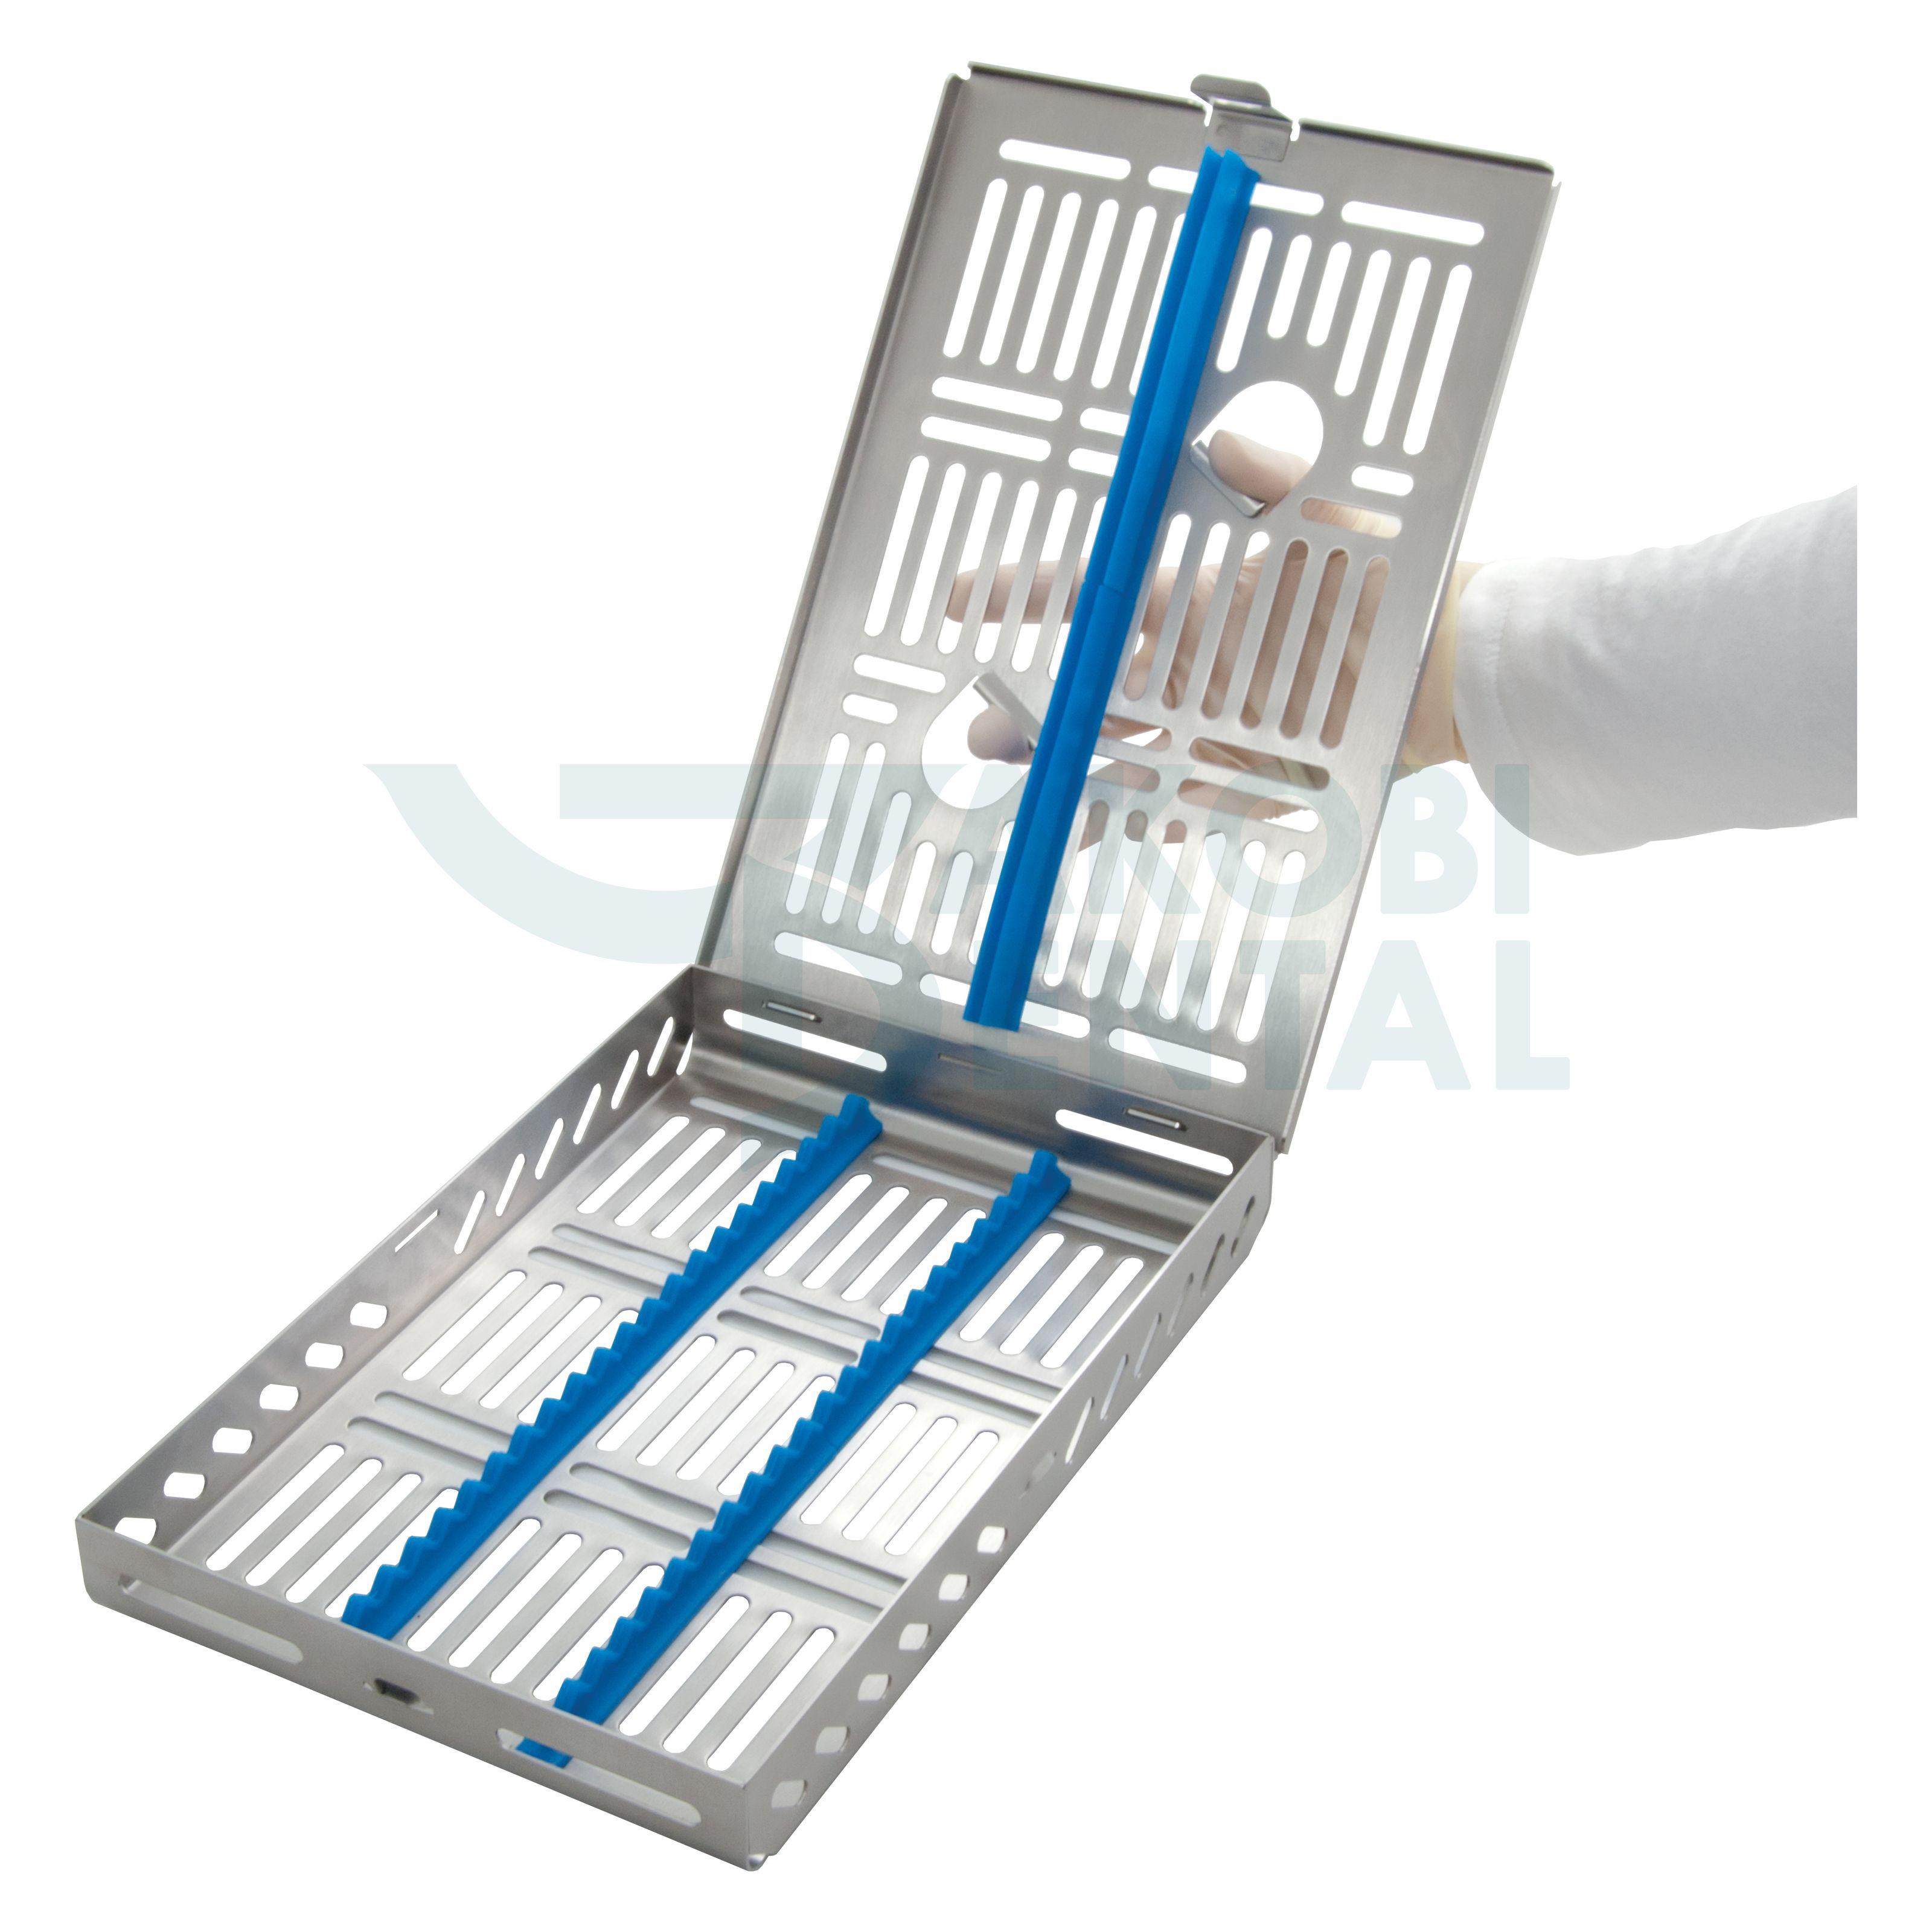 DIN cassette / tray for 21 Instr. - color select